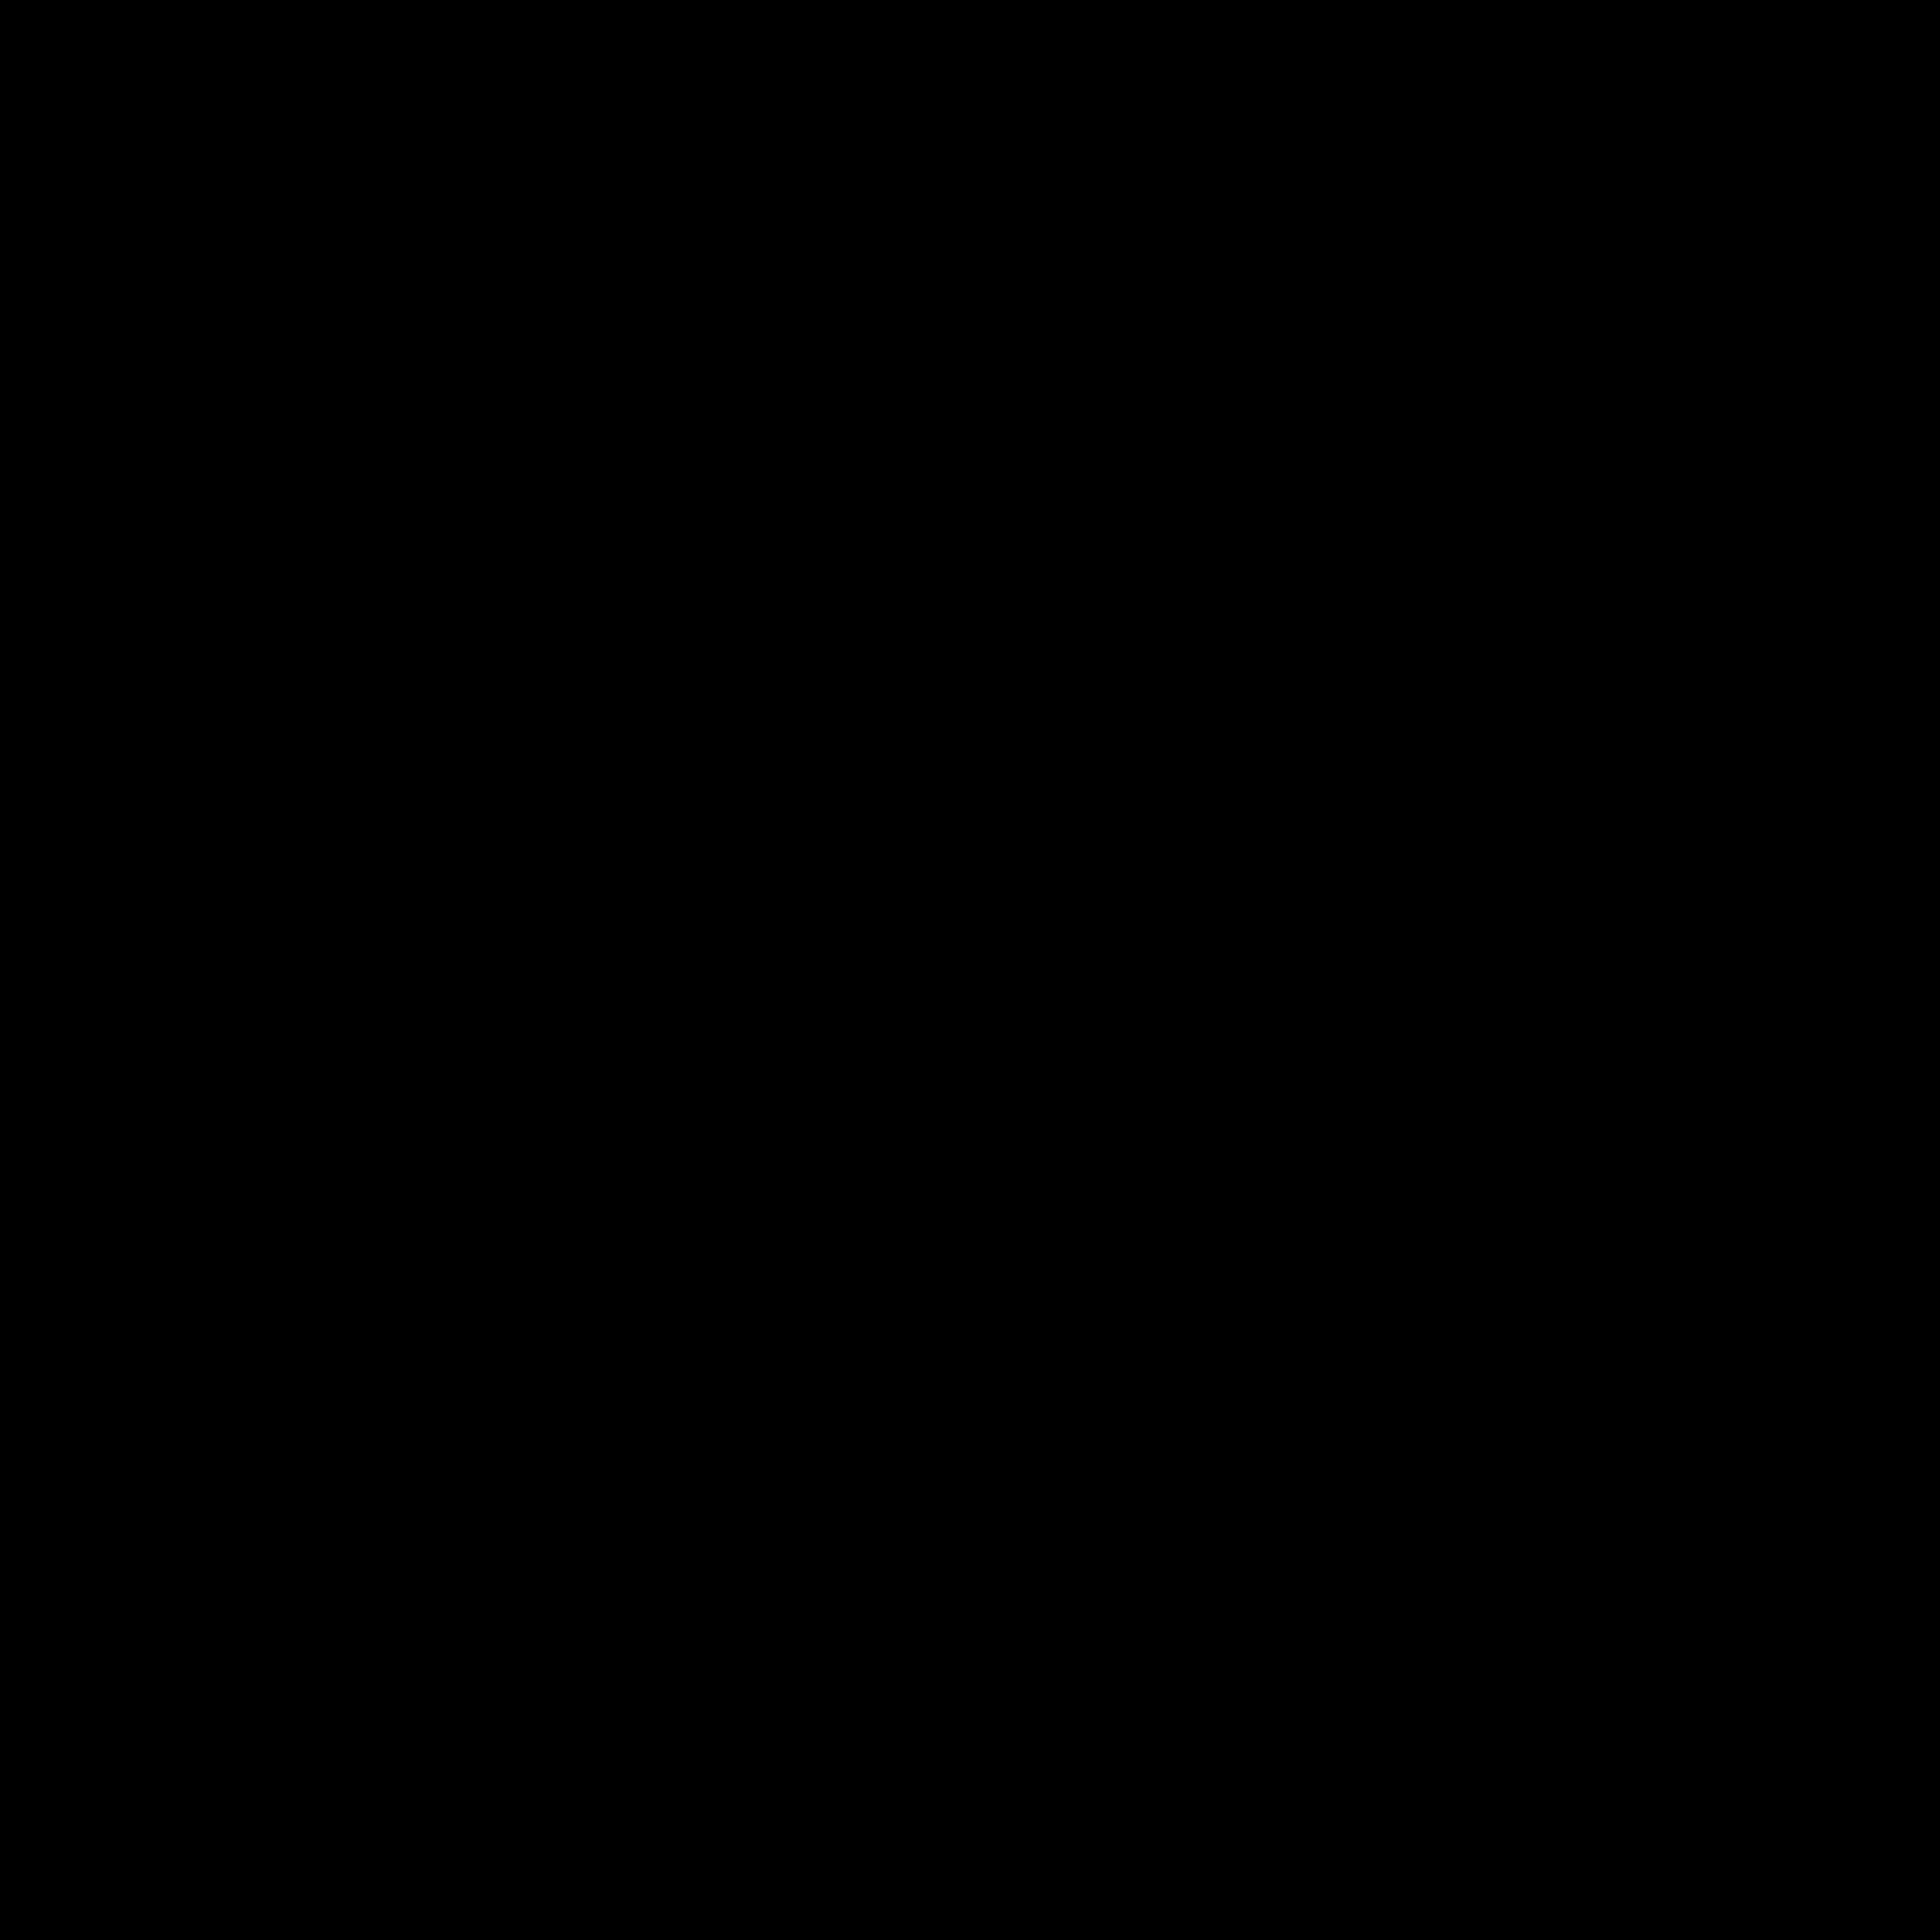 White facebook logo clipart clipart transparent Kisspng Logo Social Media Facebook Brand Clip Art - Facebook ... clipart transparent